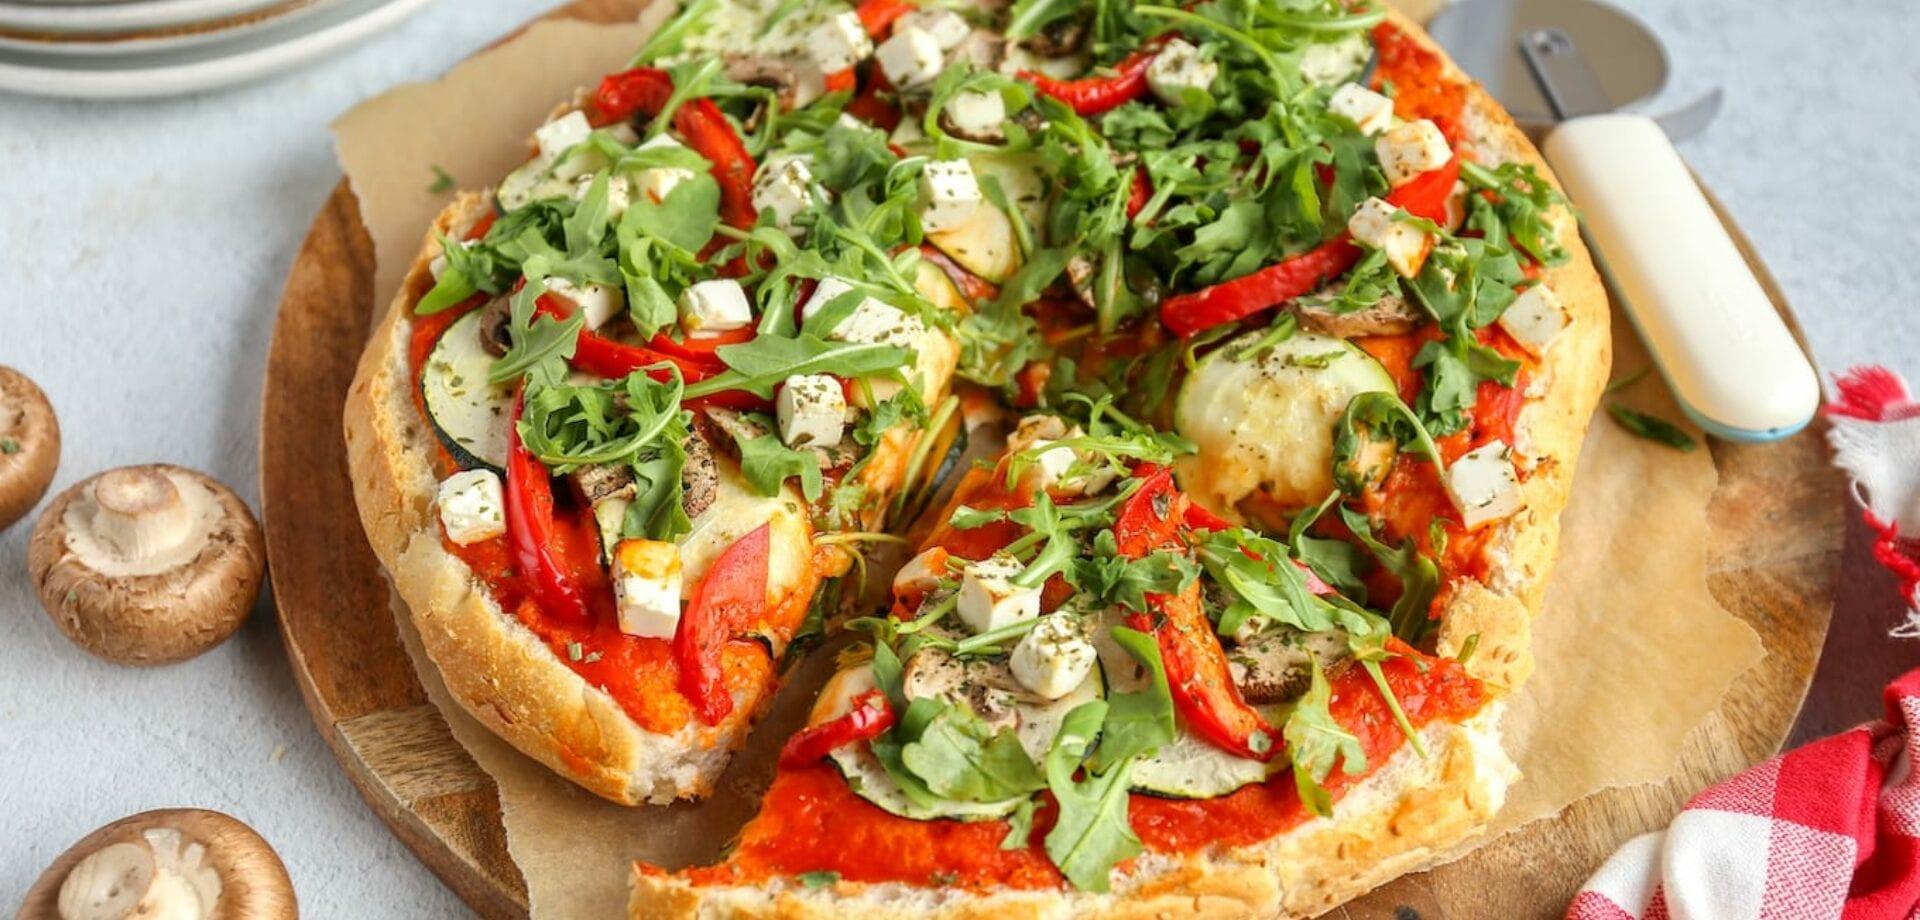 Turks brood pizza met groente